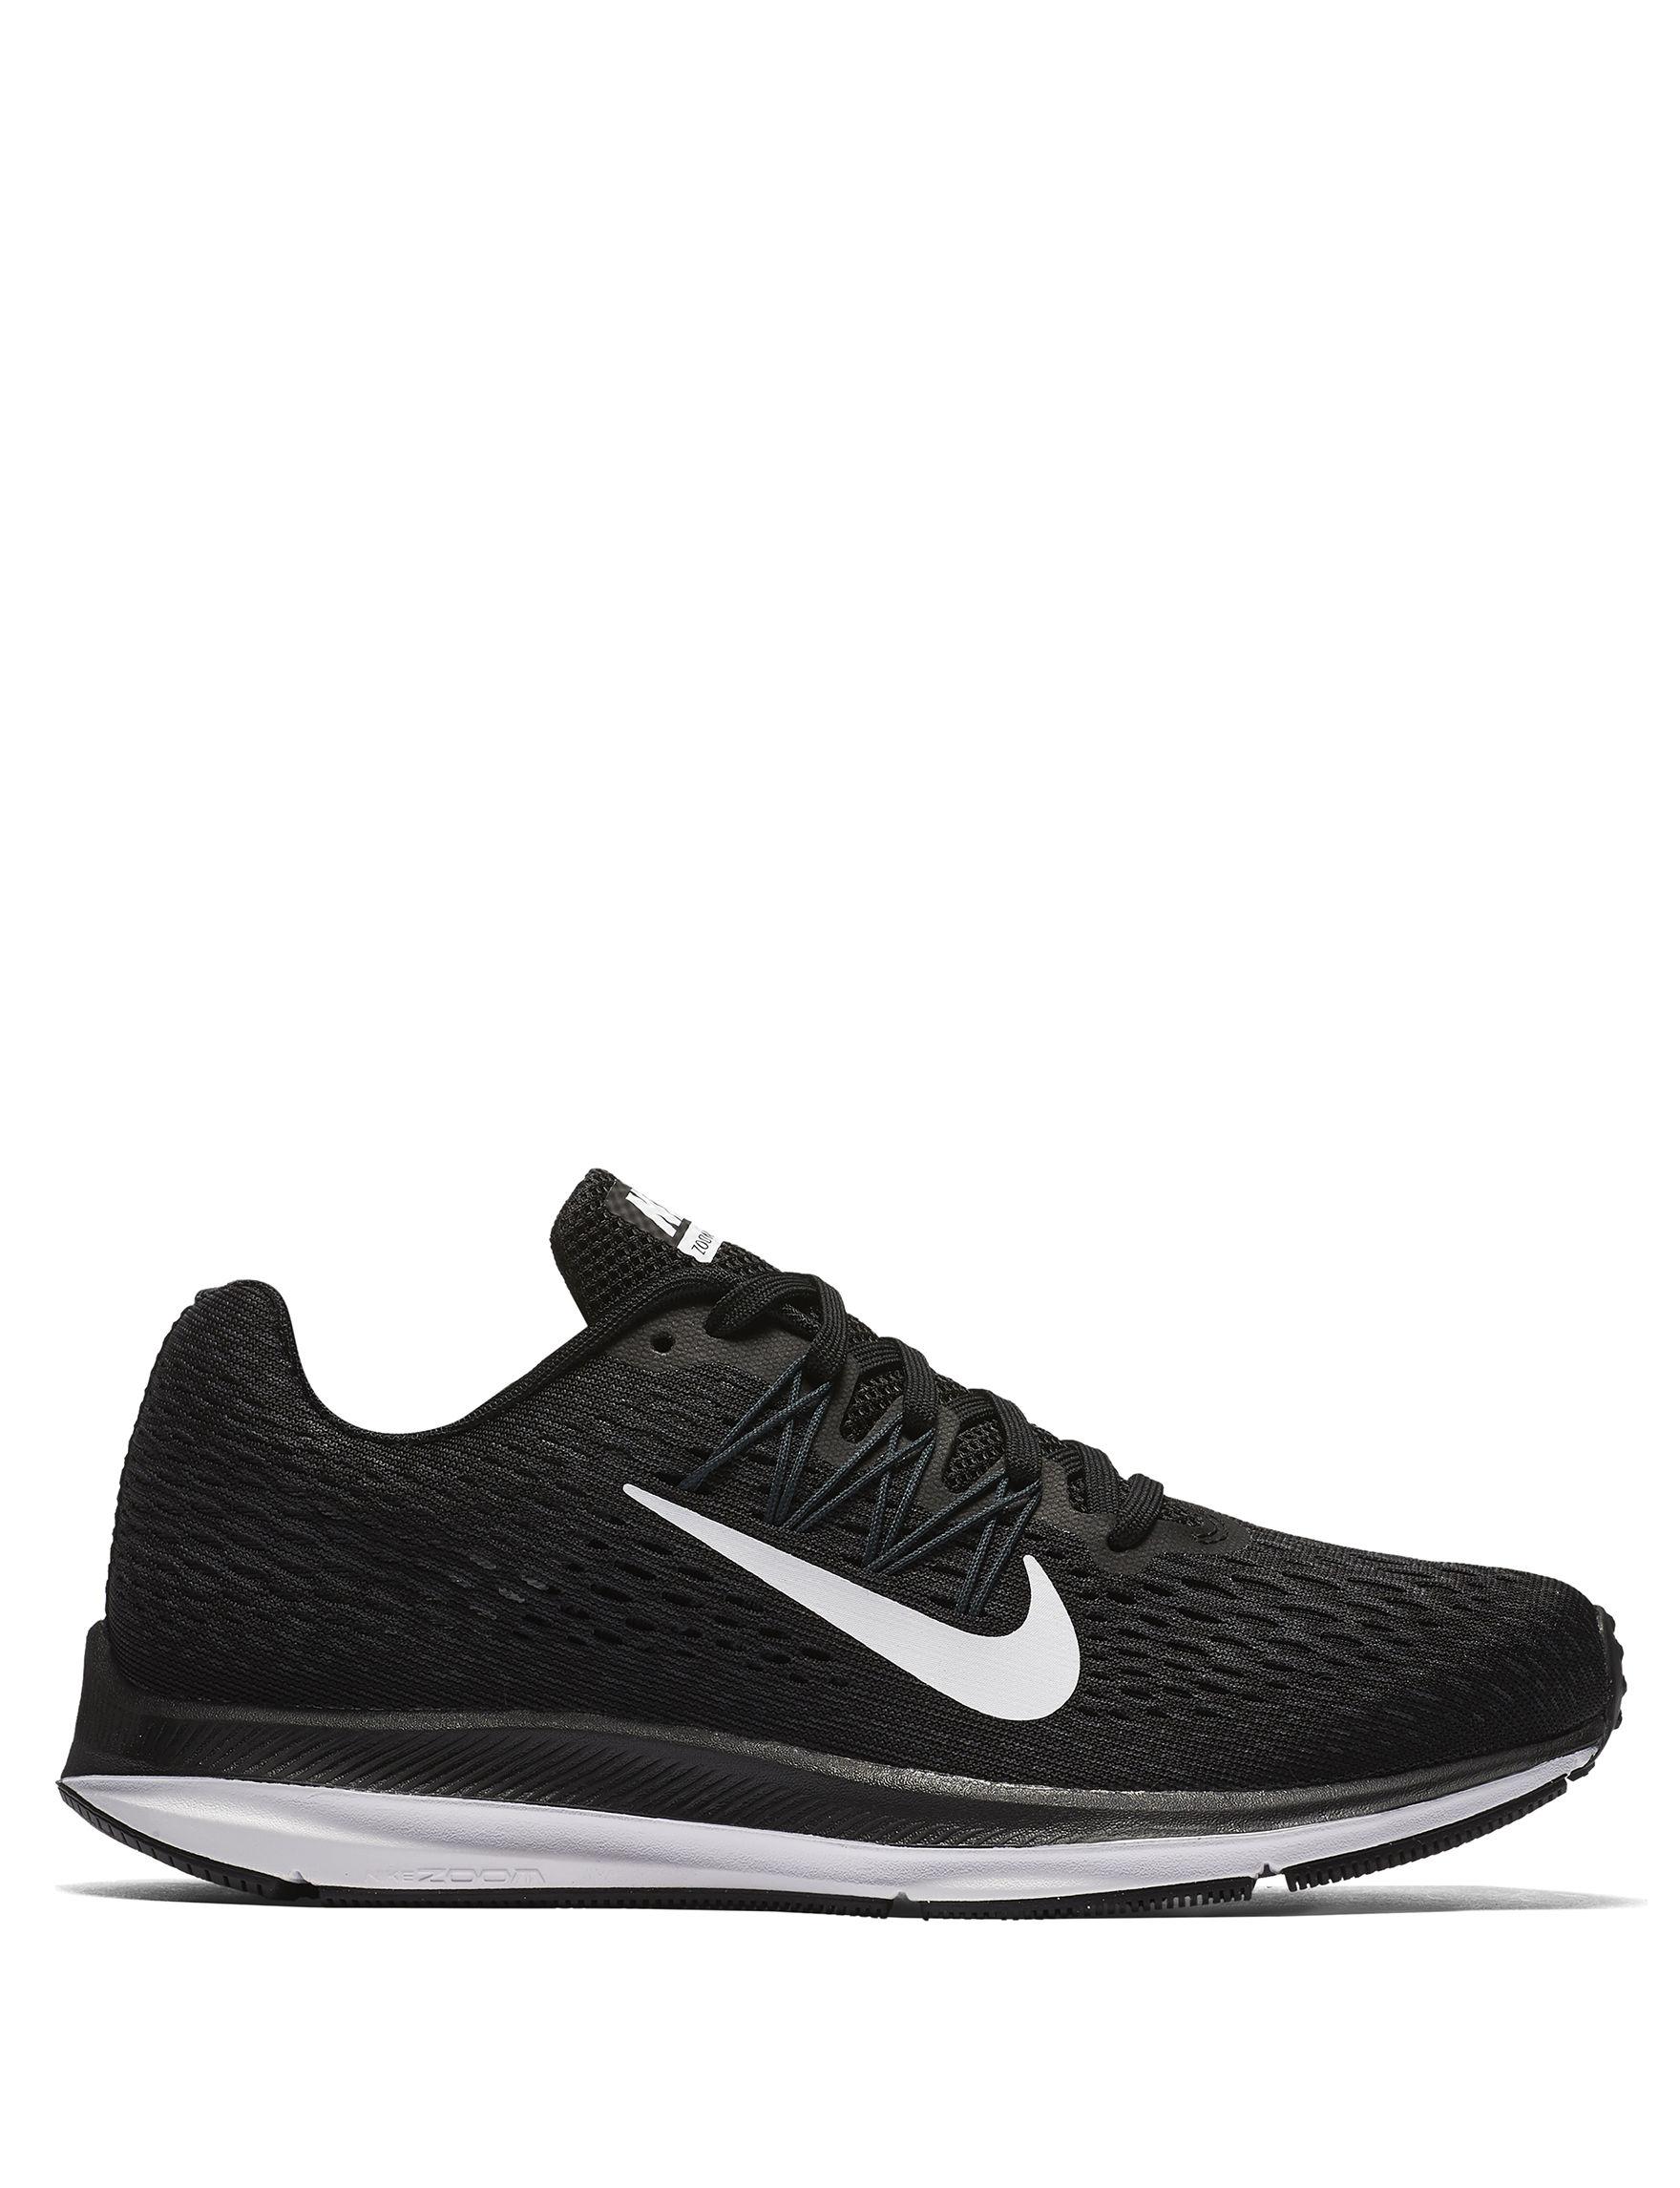 Nike Black White